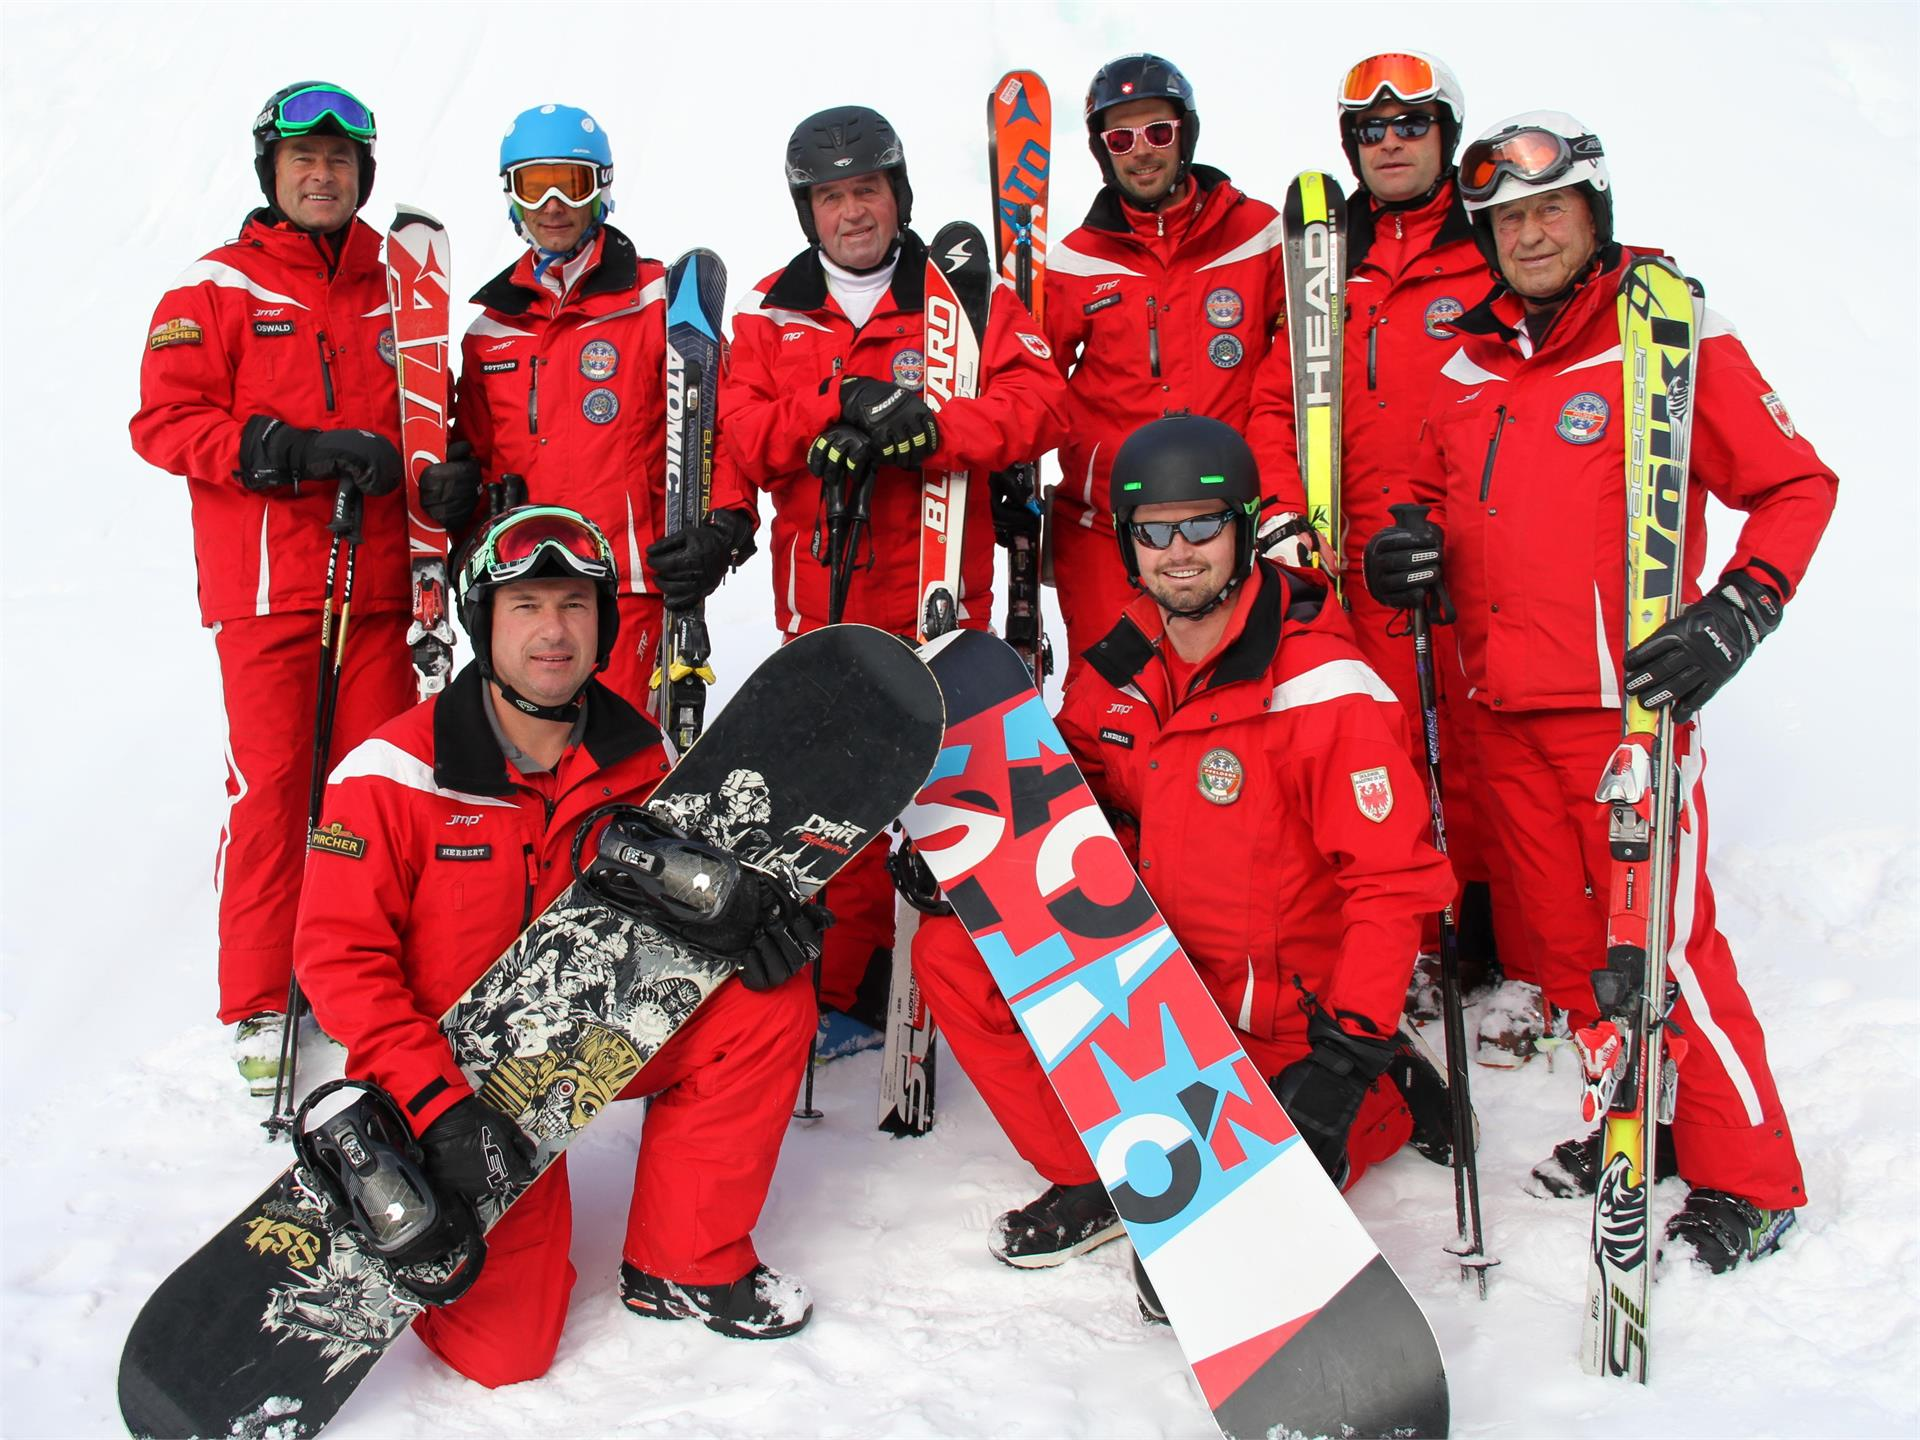 Pfelders Ski and Snowboard School